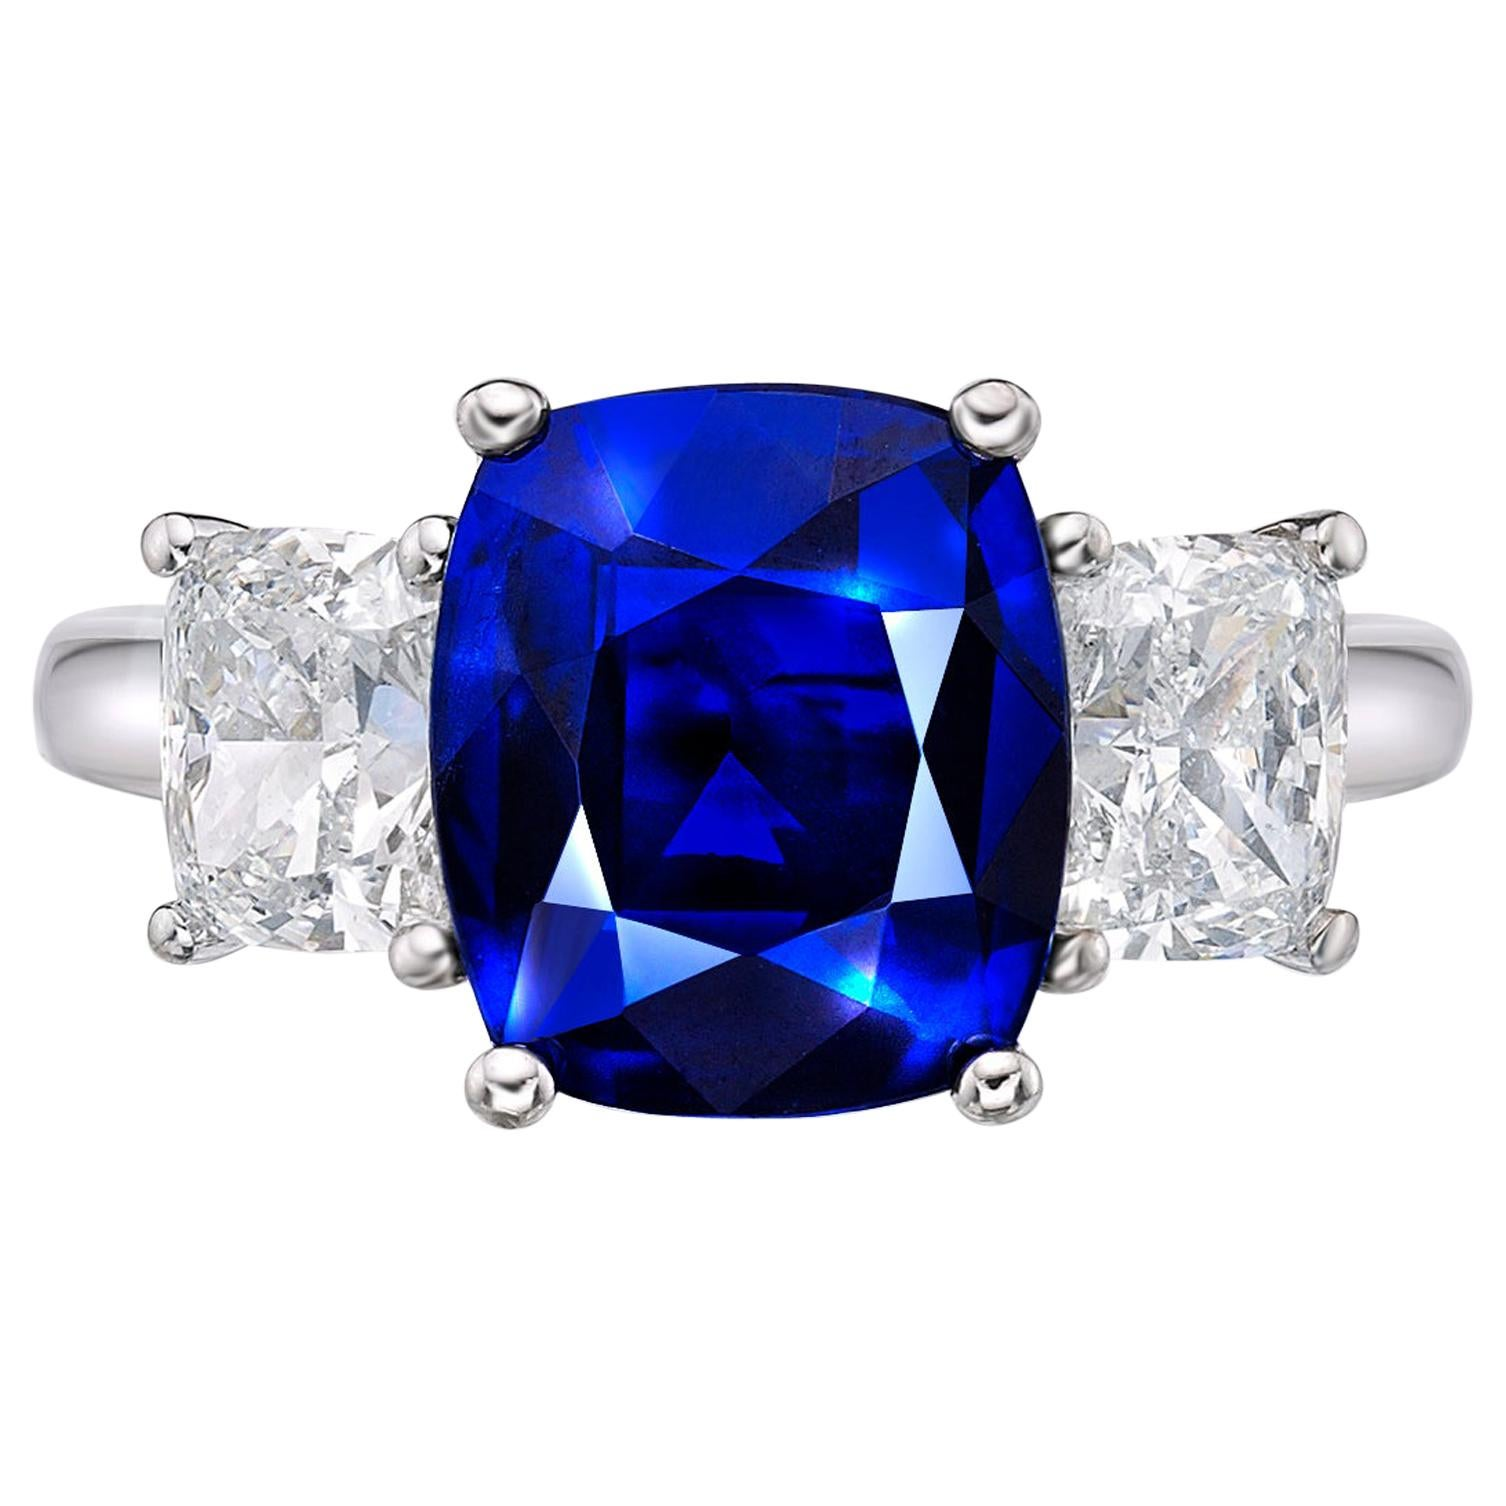 3.64 Carat Royal Blue Ceylon Sapphire GRS Certified Unheated GIA - 2 E color